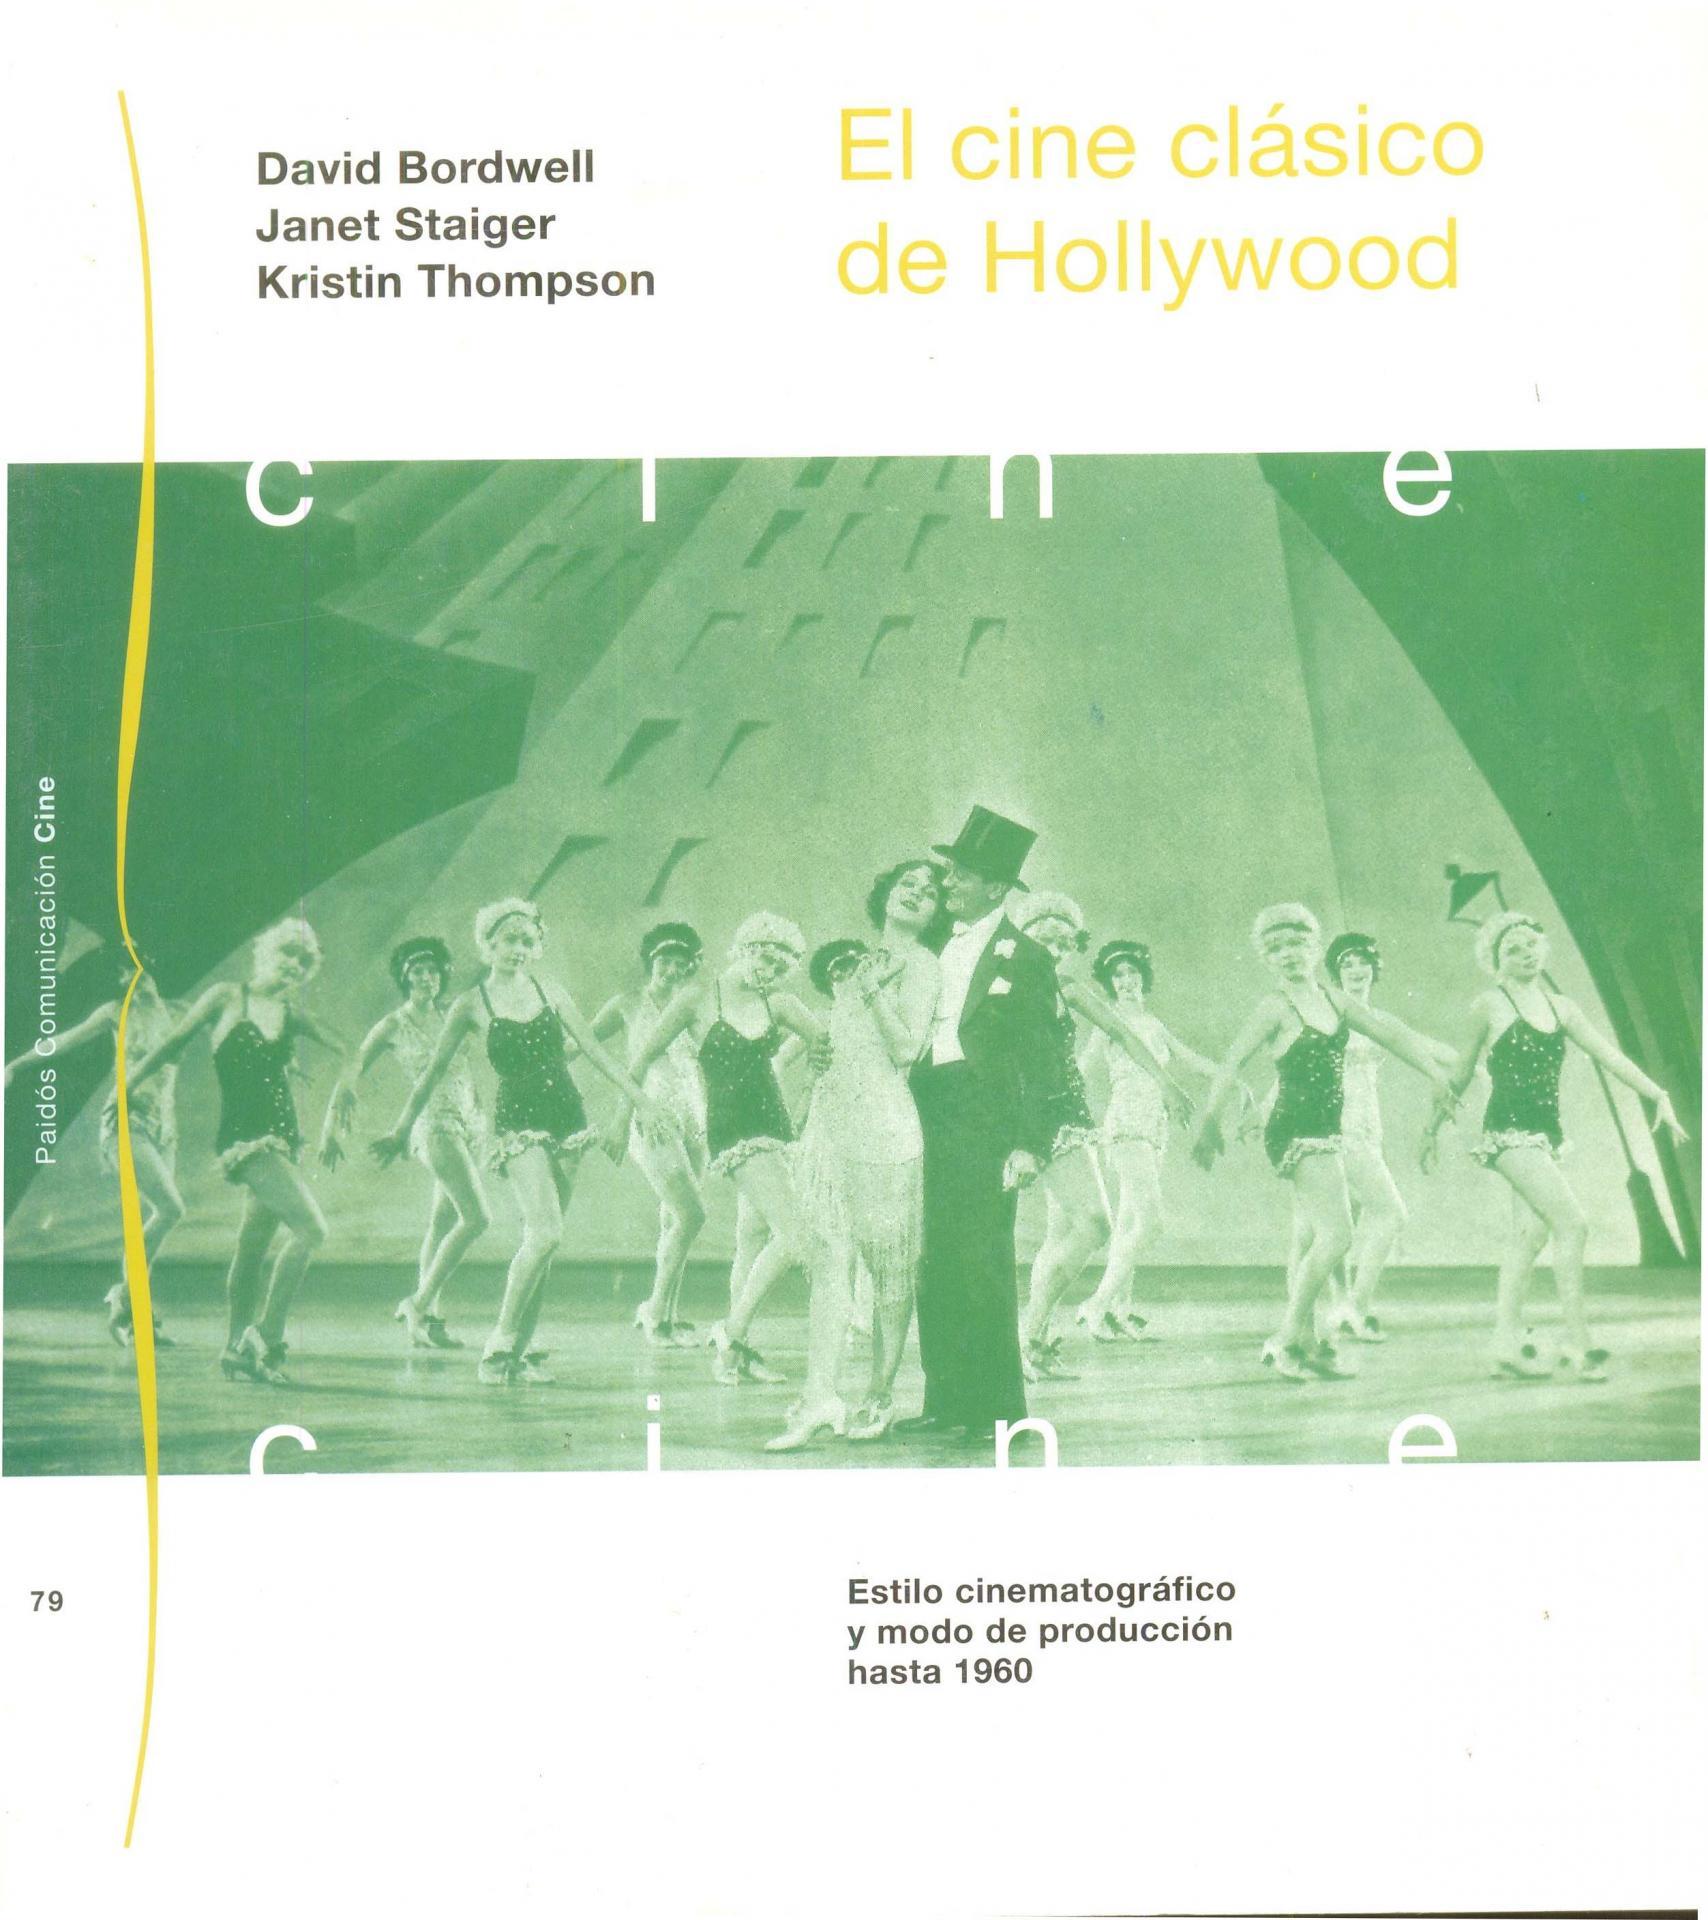 EL CINE CLÁSICO DE HOLLYWOOD. Bordwell, D.